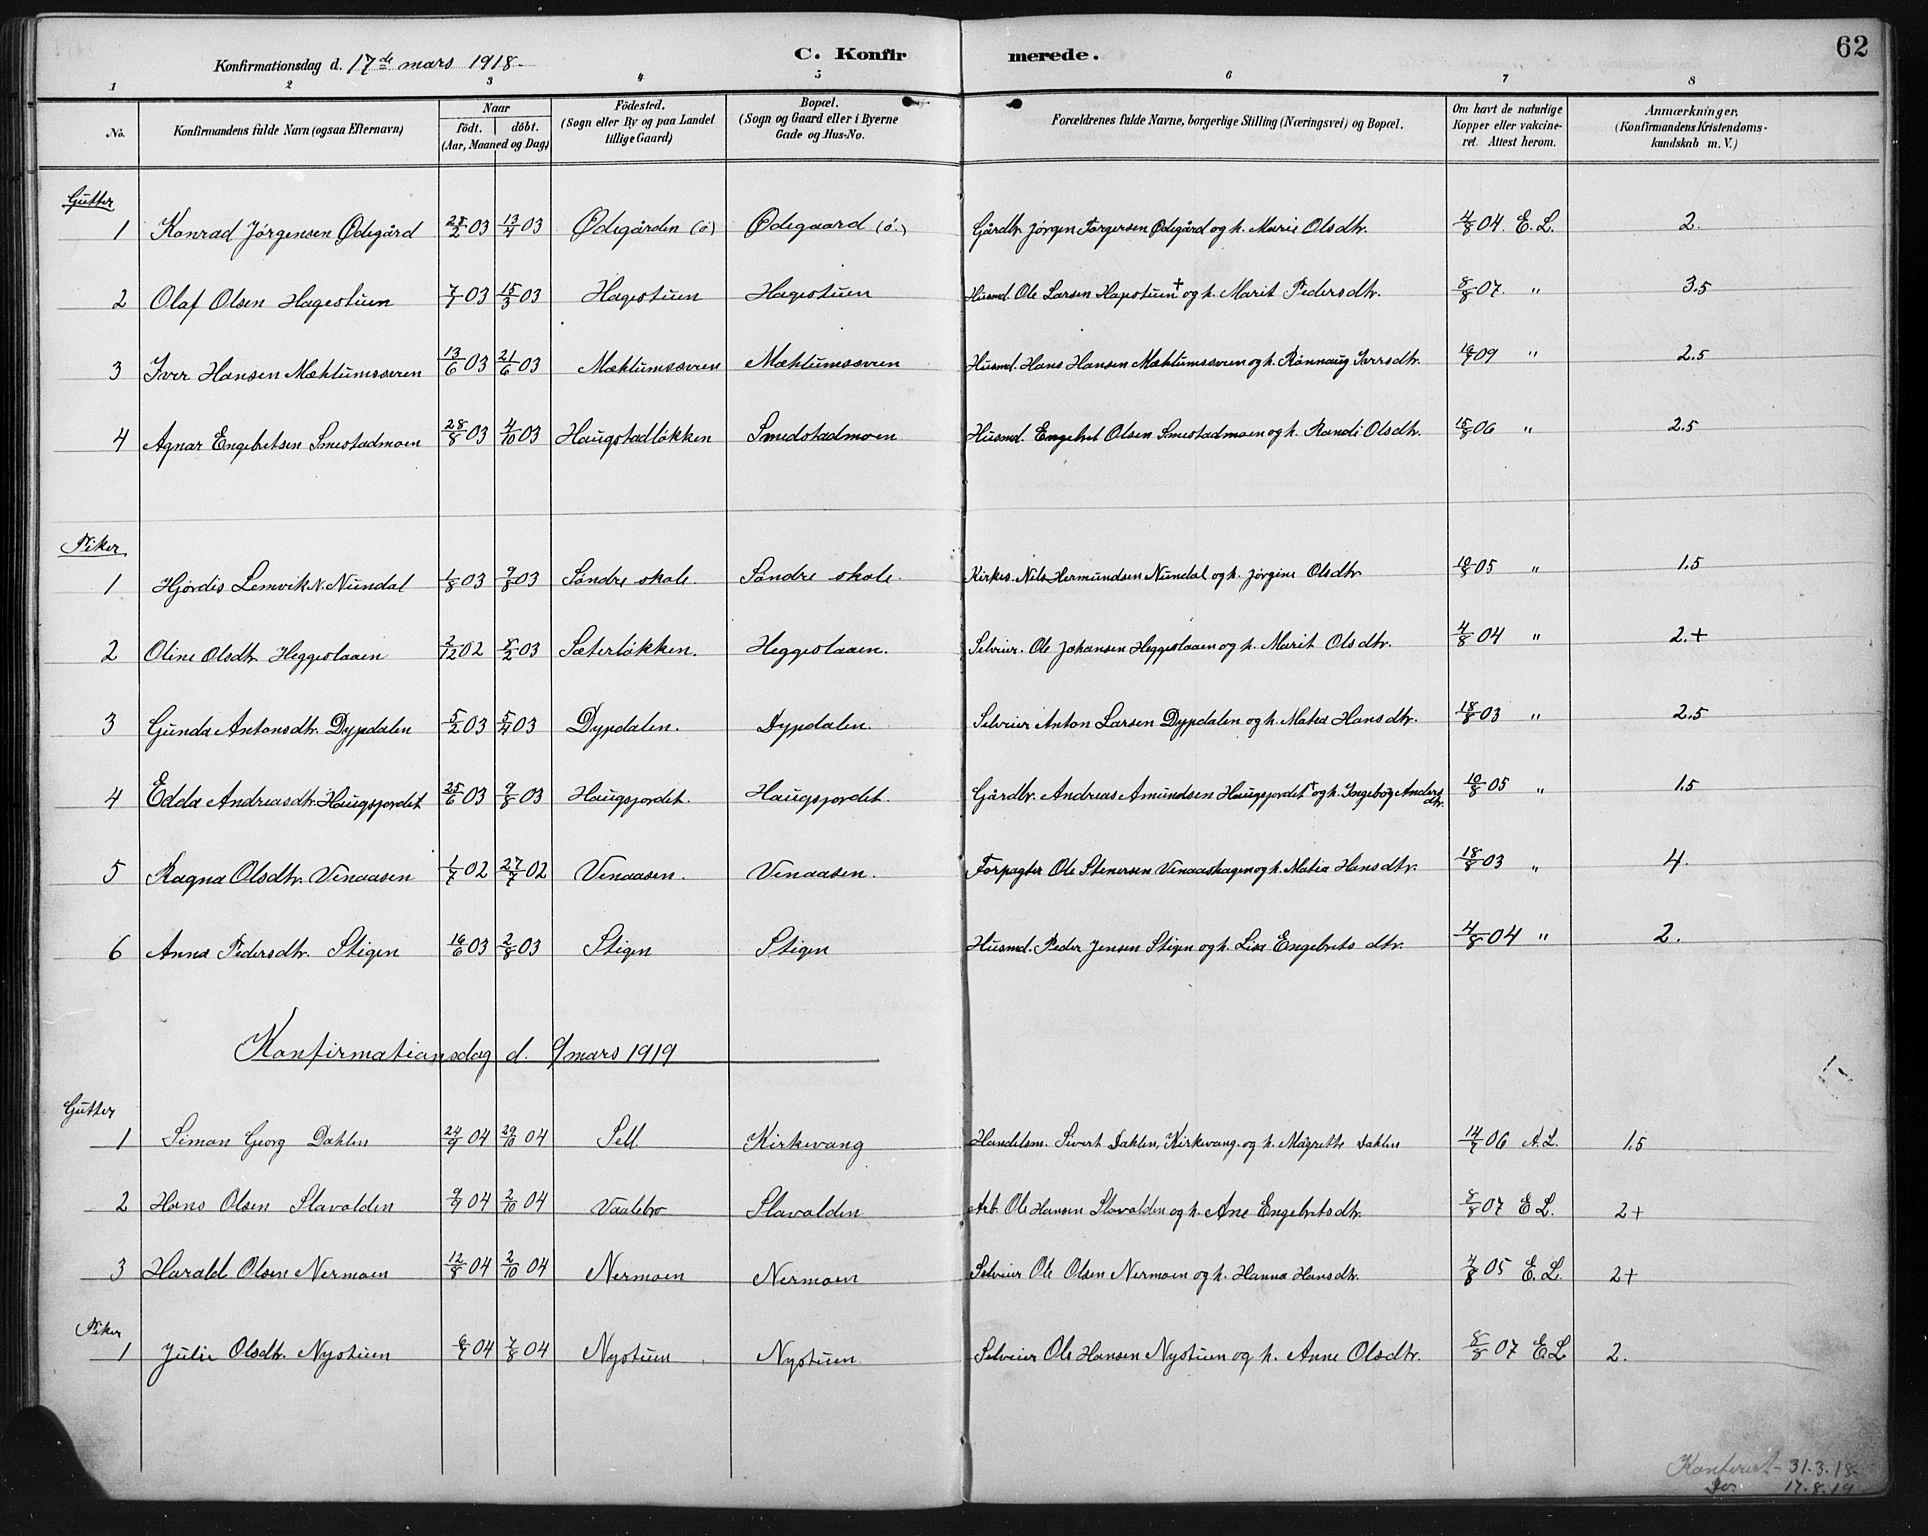 SAH, Ringebu prestekontor, Klokkerbok nr. 8, 1890-1922, s. 62